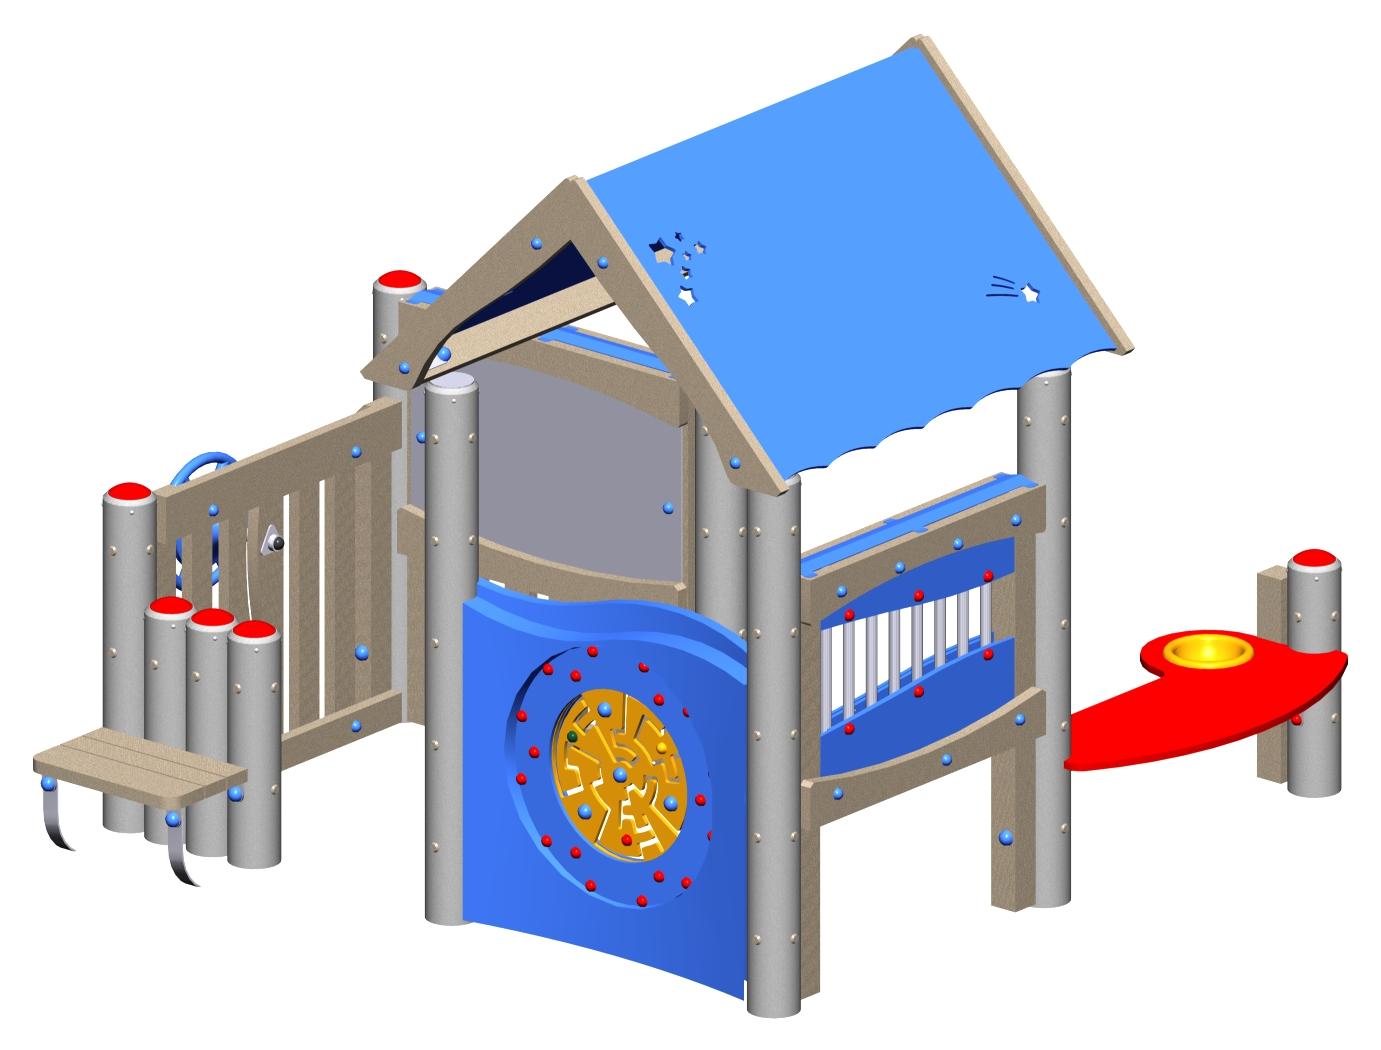 Activity Playhouse (Metal & Plastic)